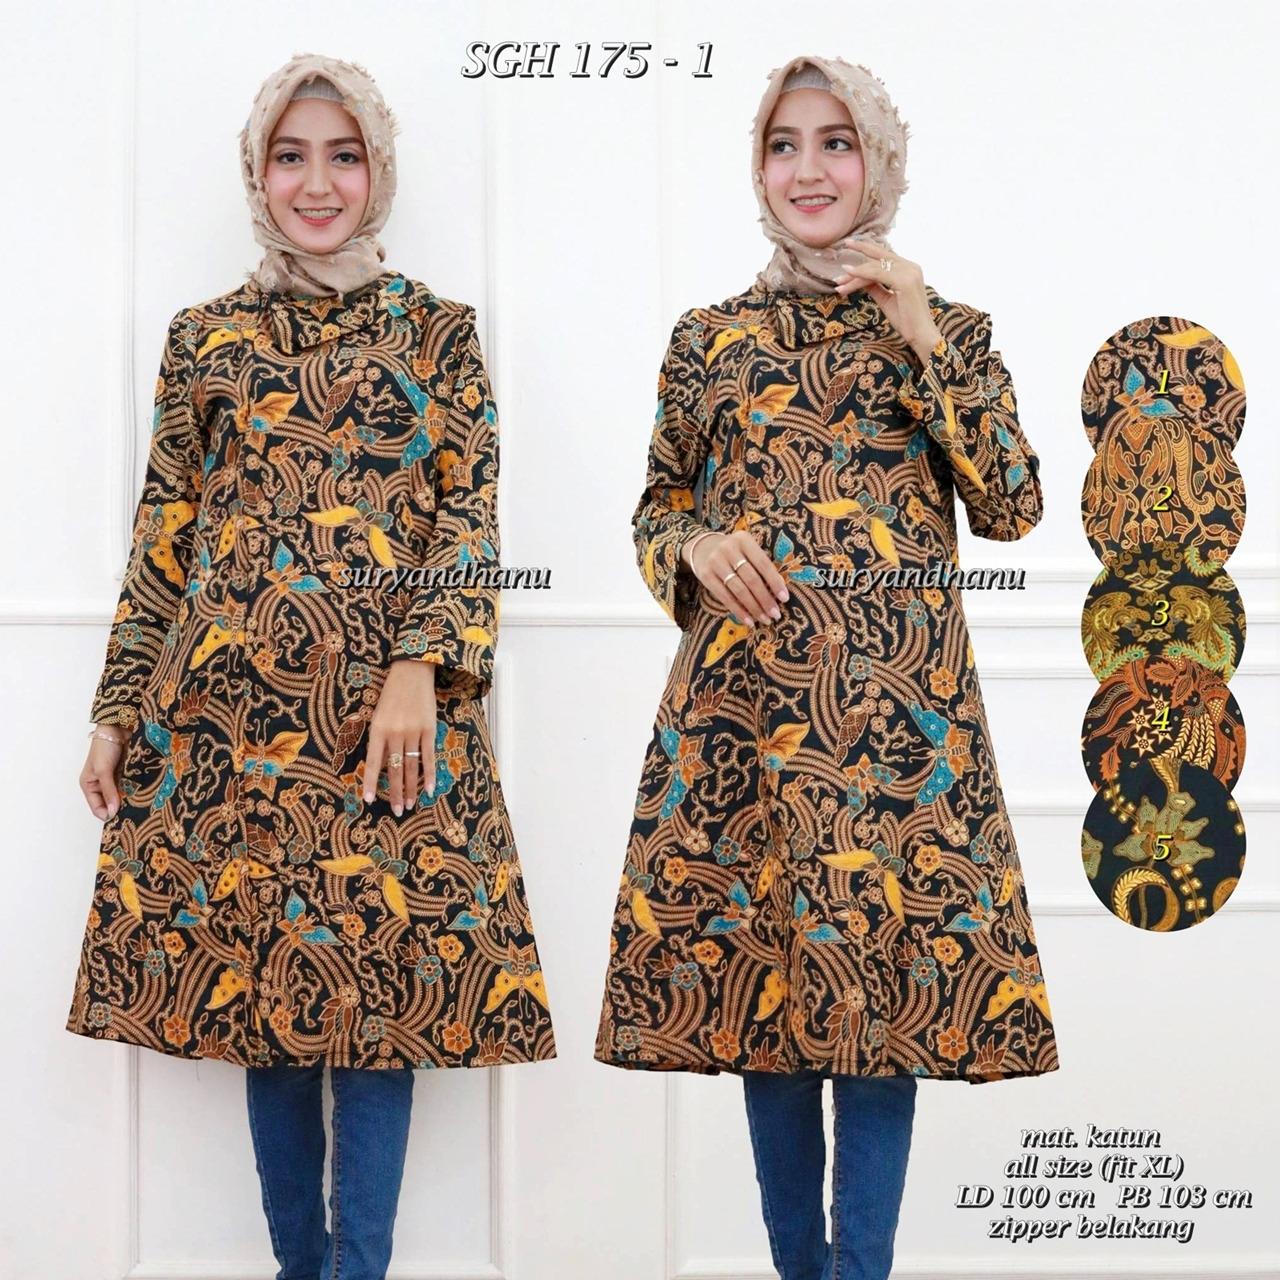 47 Terkini Model Baju Batik Qonita Terbaru